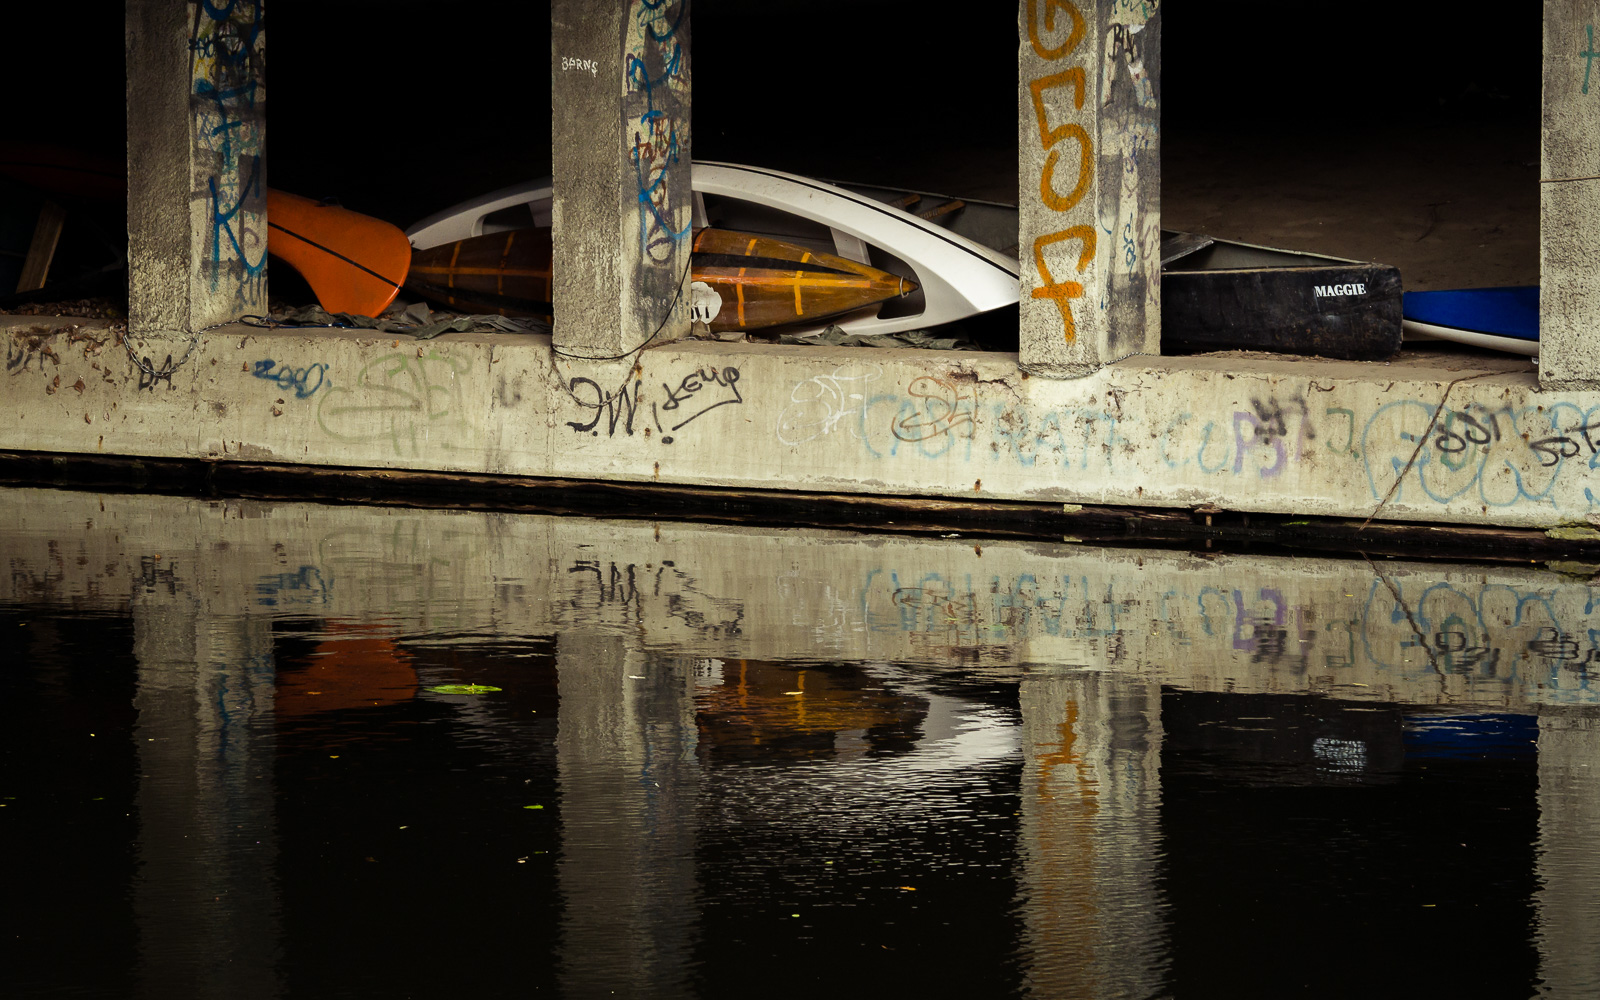 Boats stored under a bridge in Hamburg